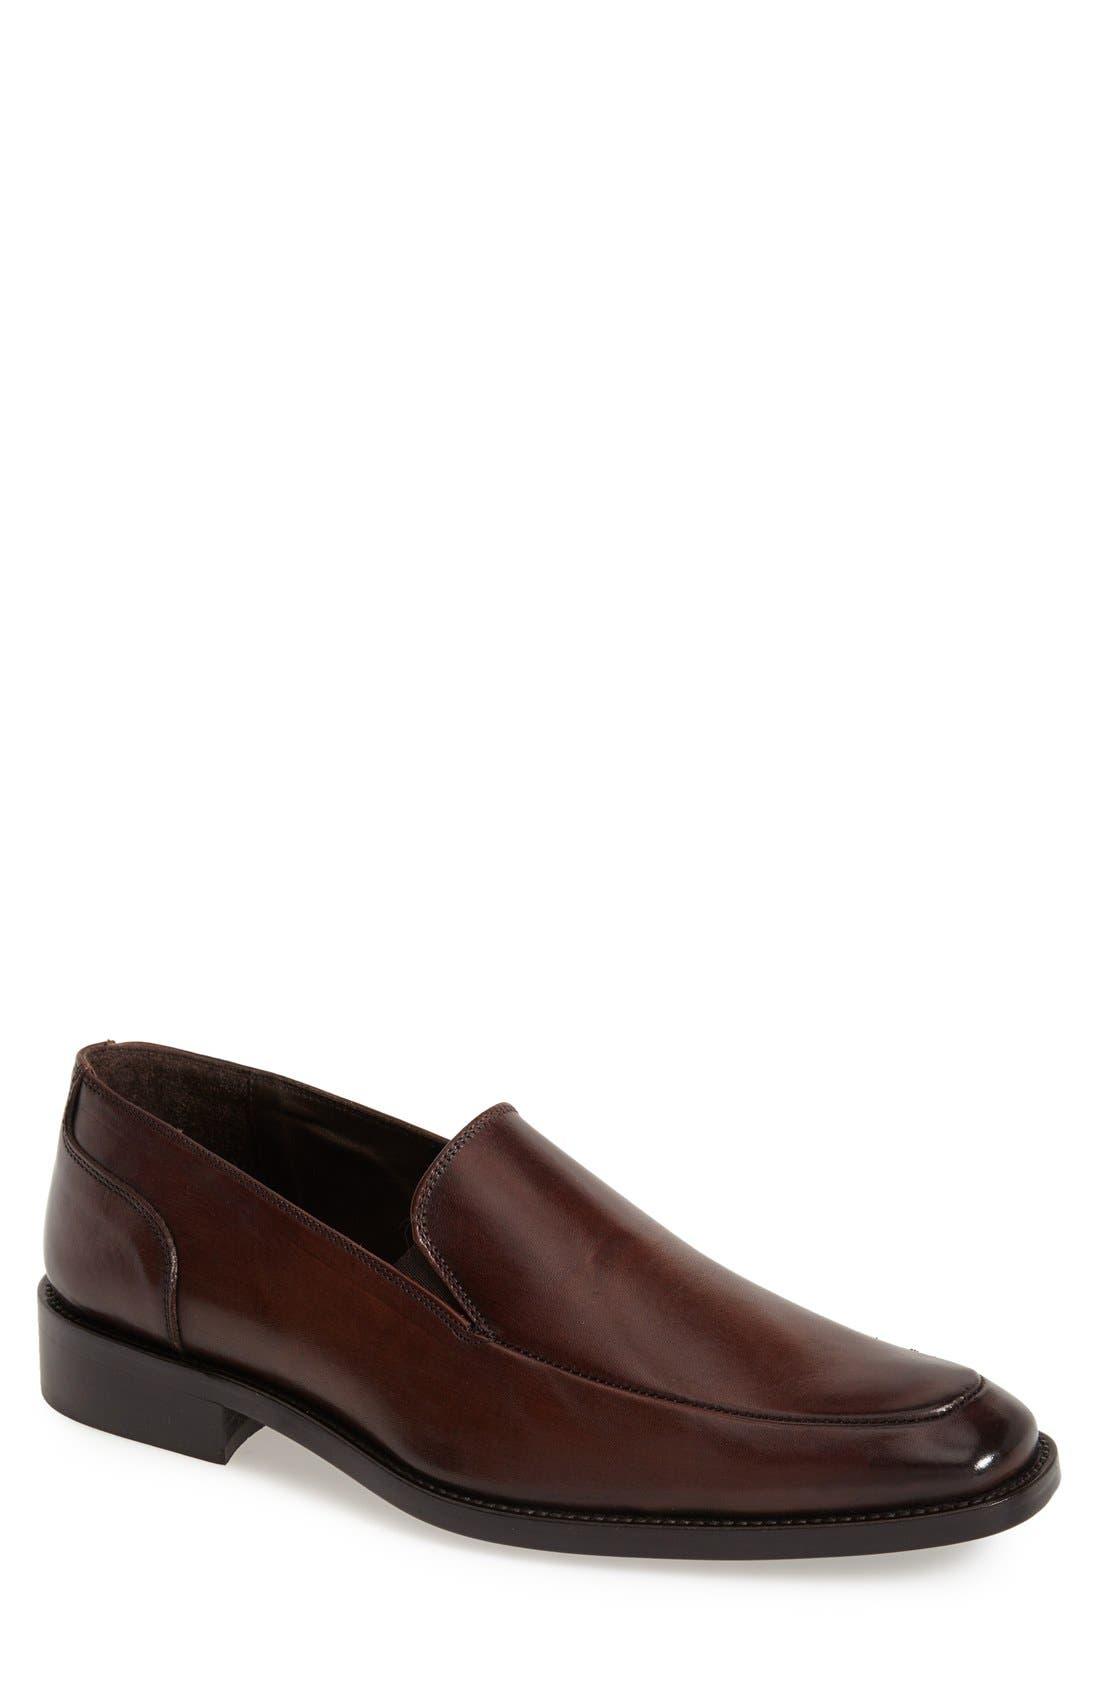 Main Image - To Boot New York 'Erik' Venetian Loafer